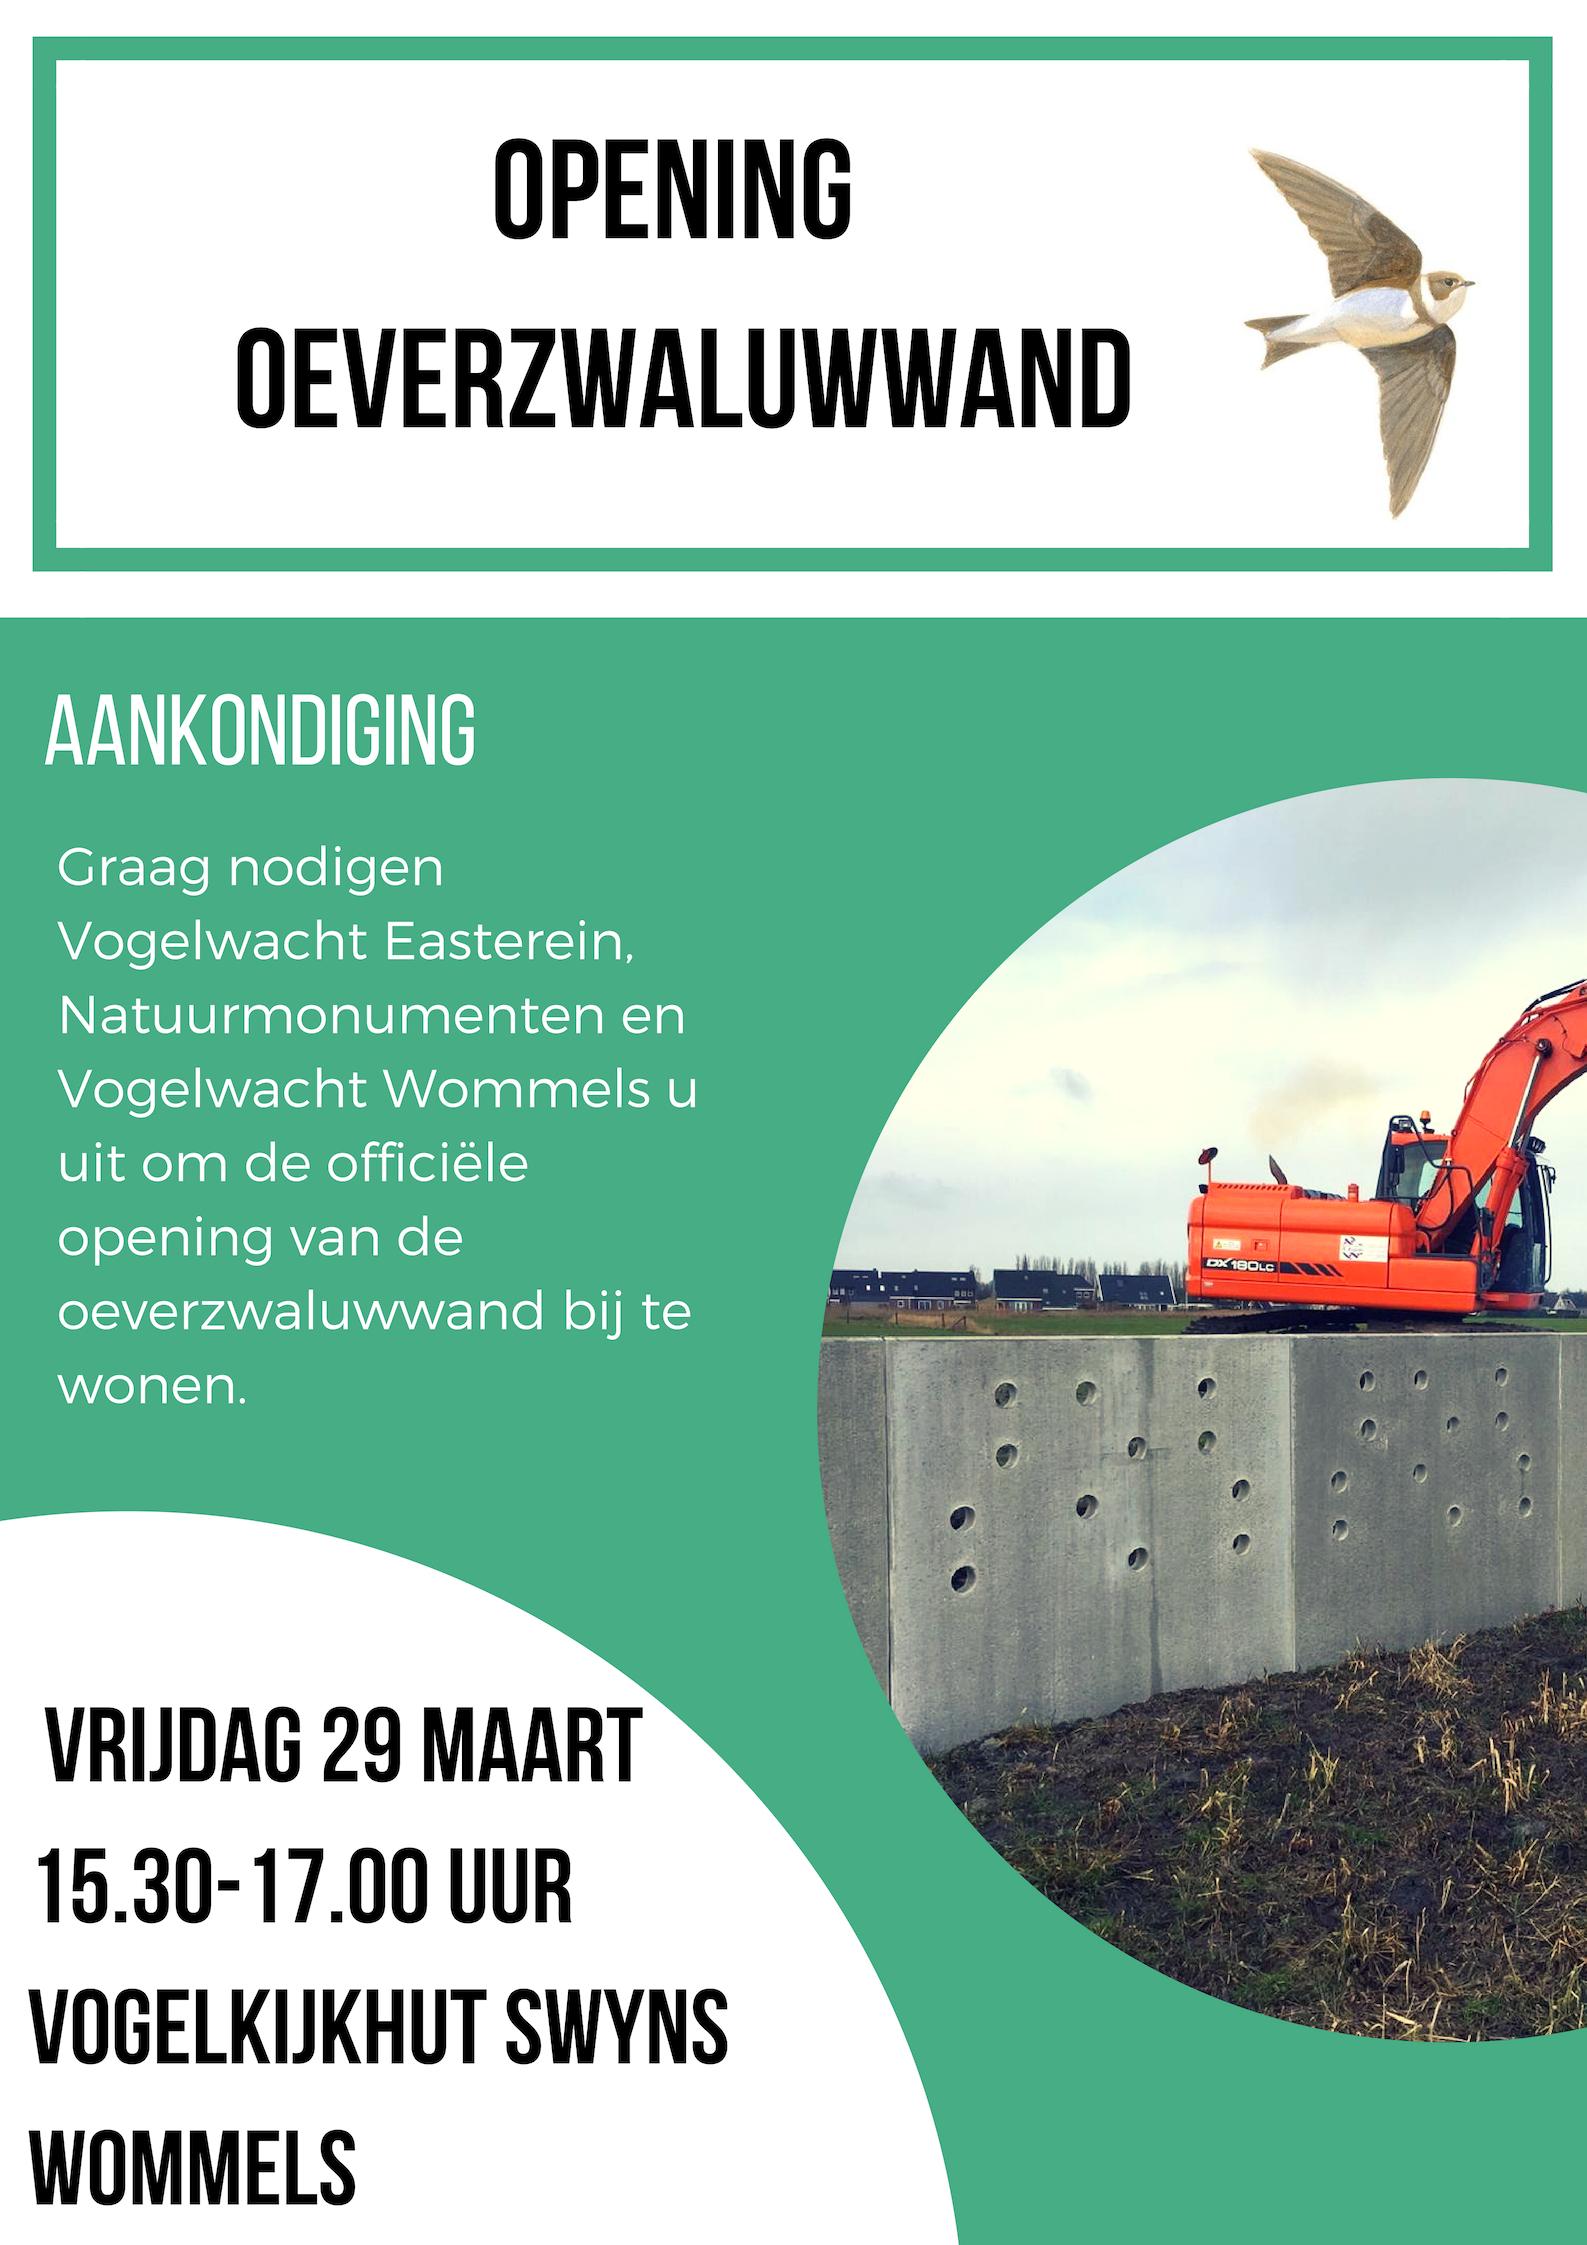 Opening Oeverzwaluwwand 29 Maart